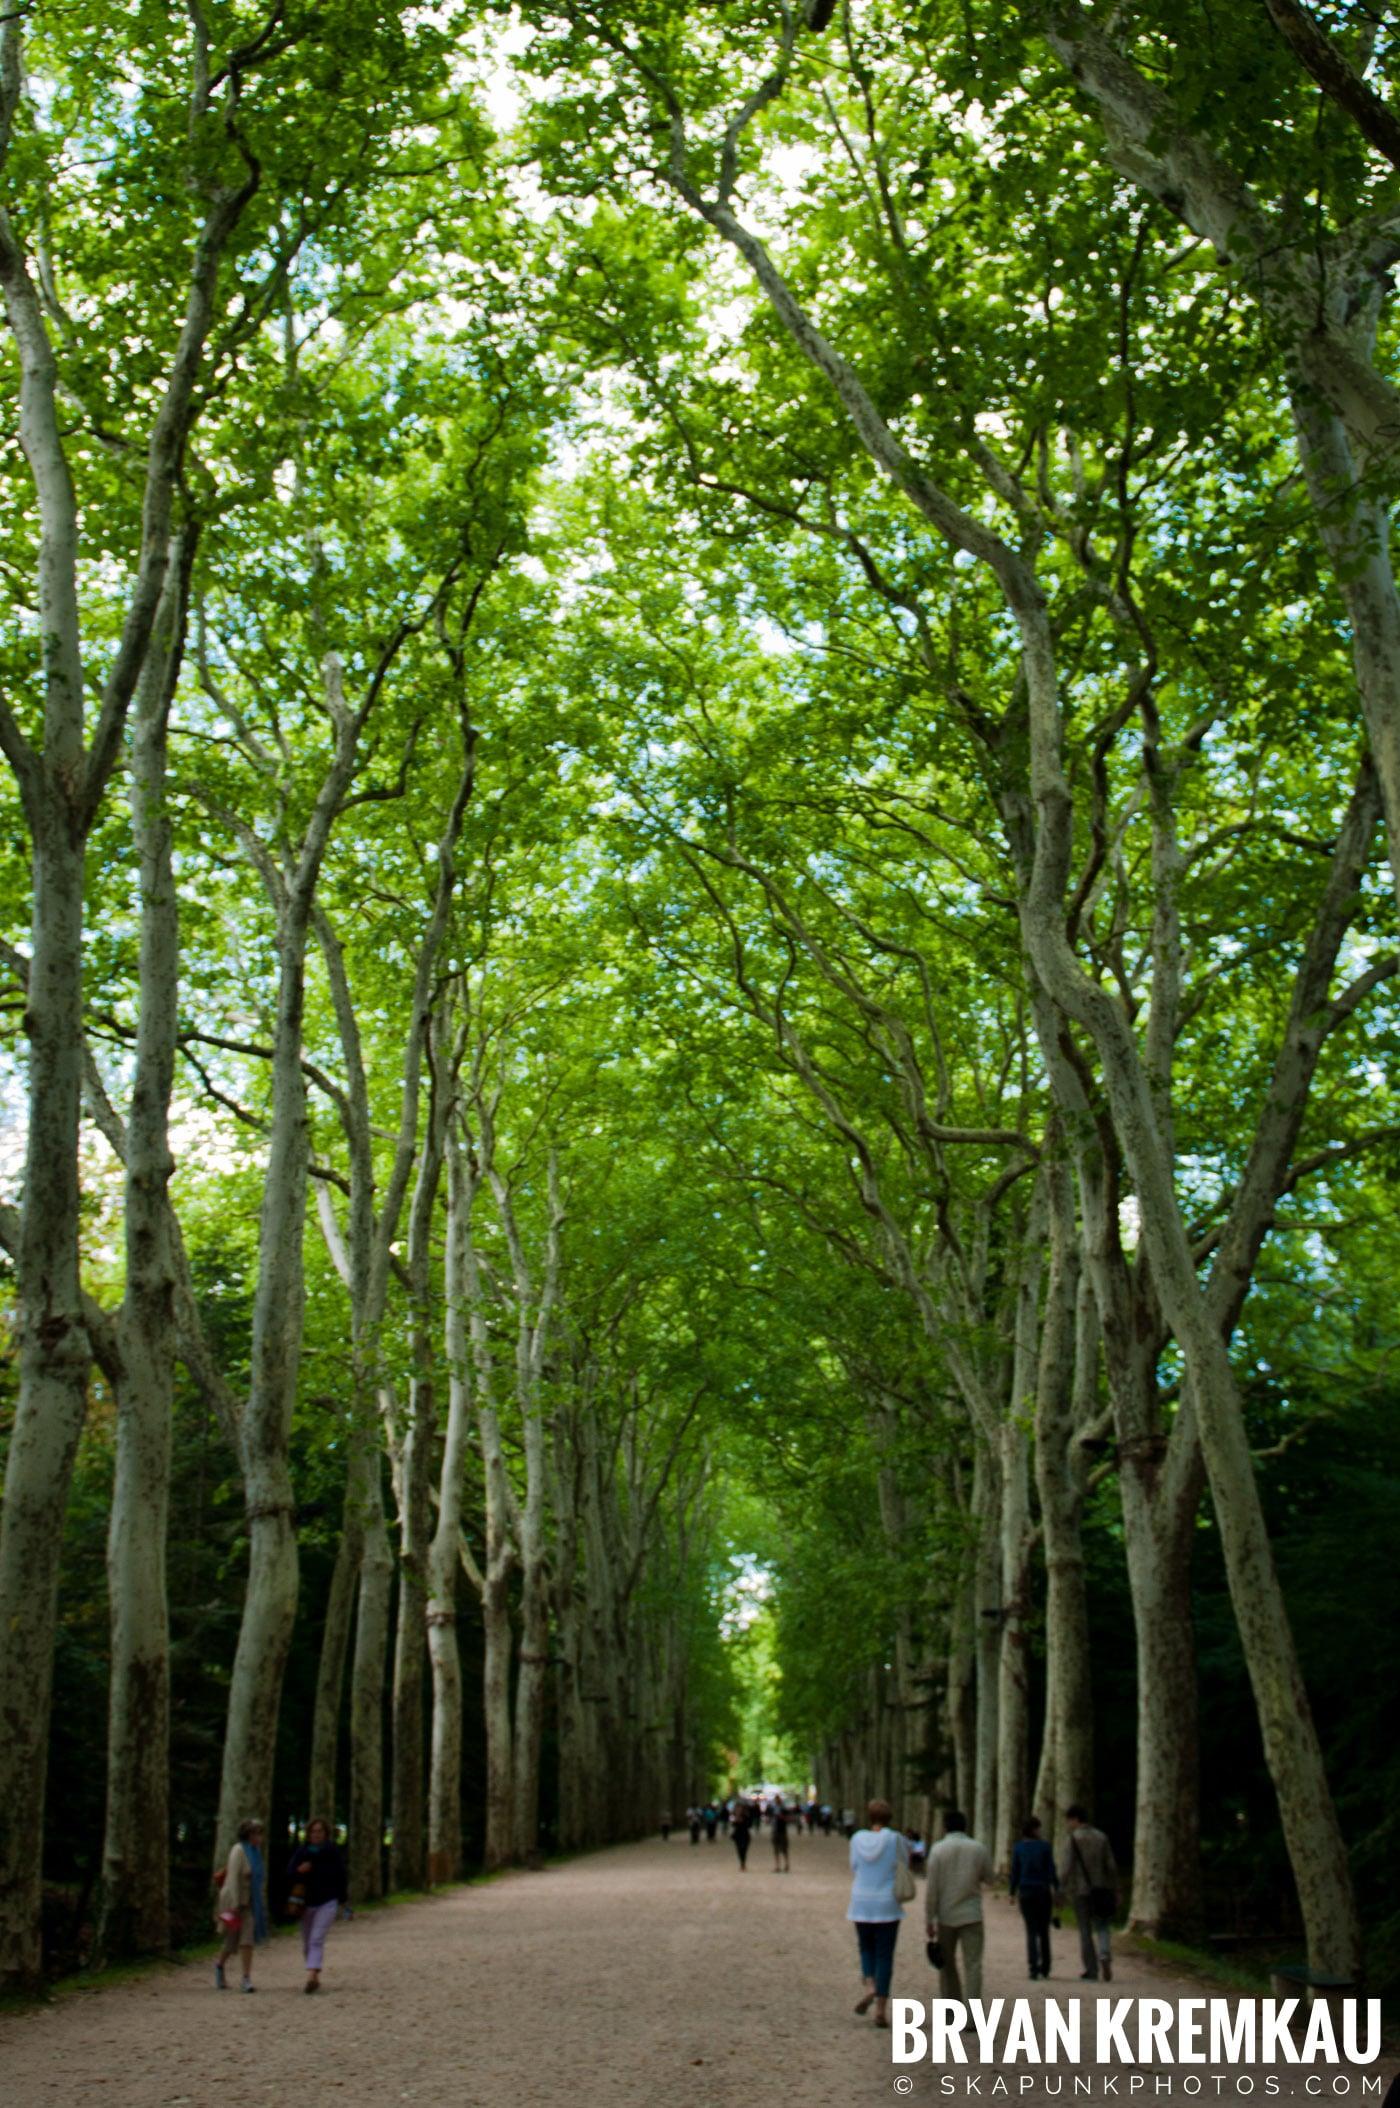 Paris, France Honeymoon - Day 7 - 7.24.11 (24)